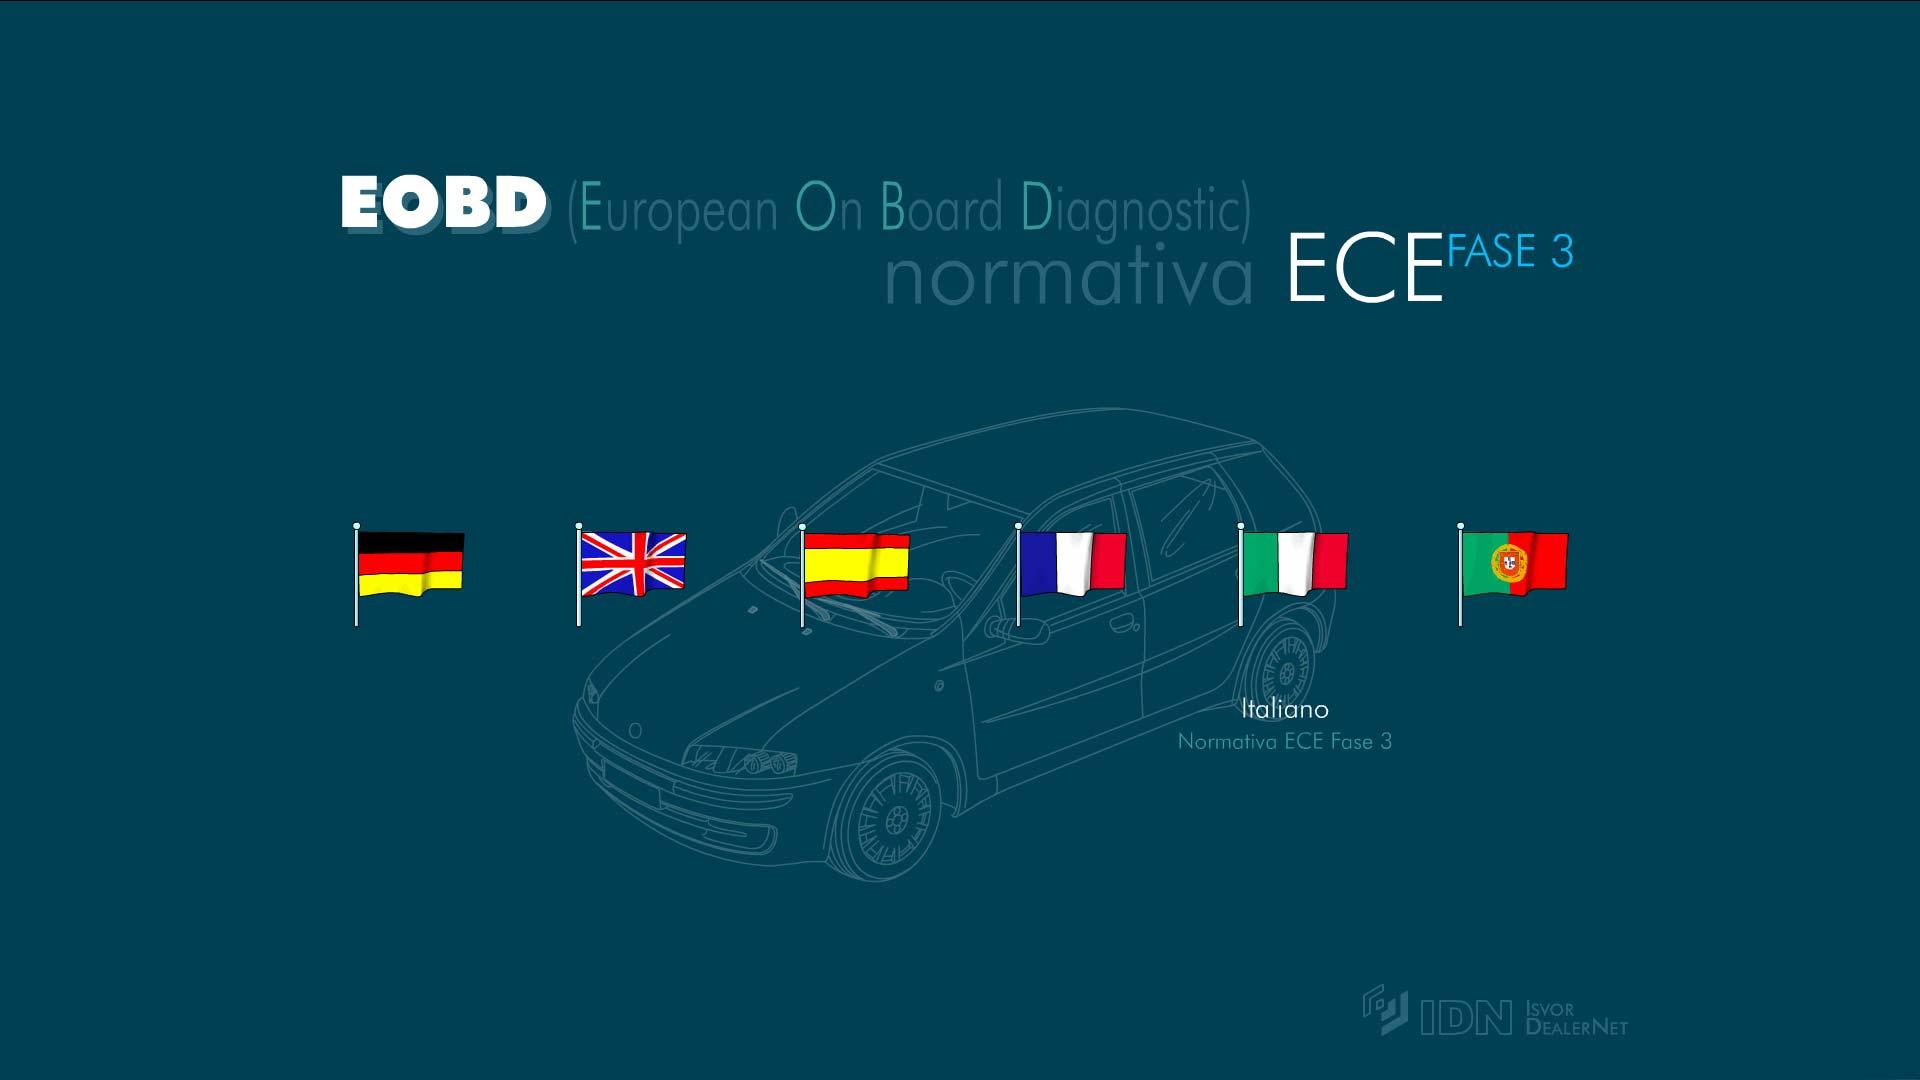 FIAT ISVOR: EOBD